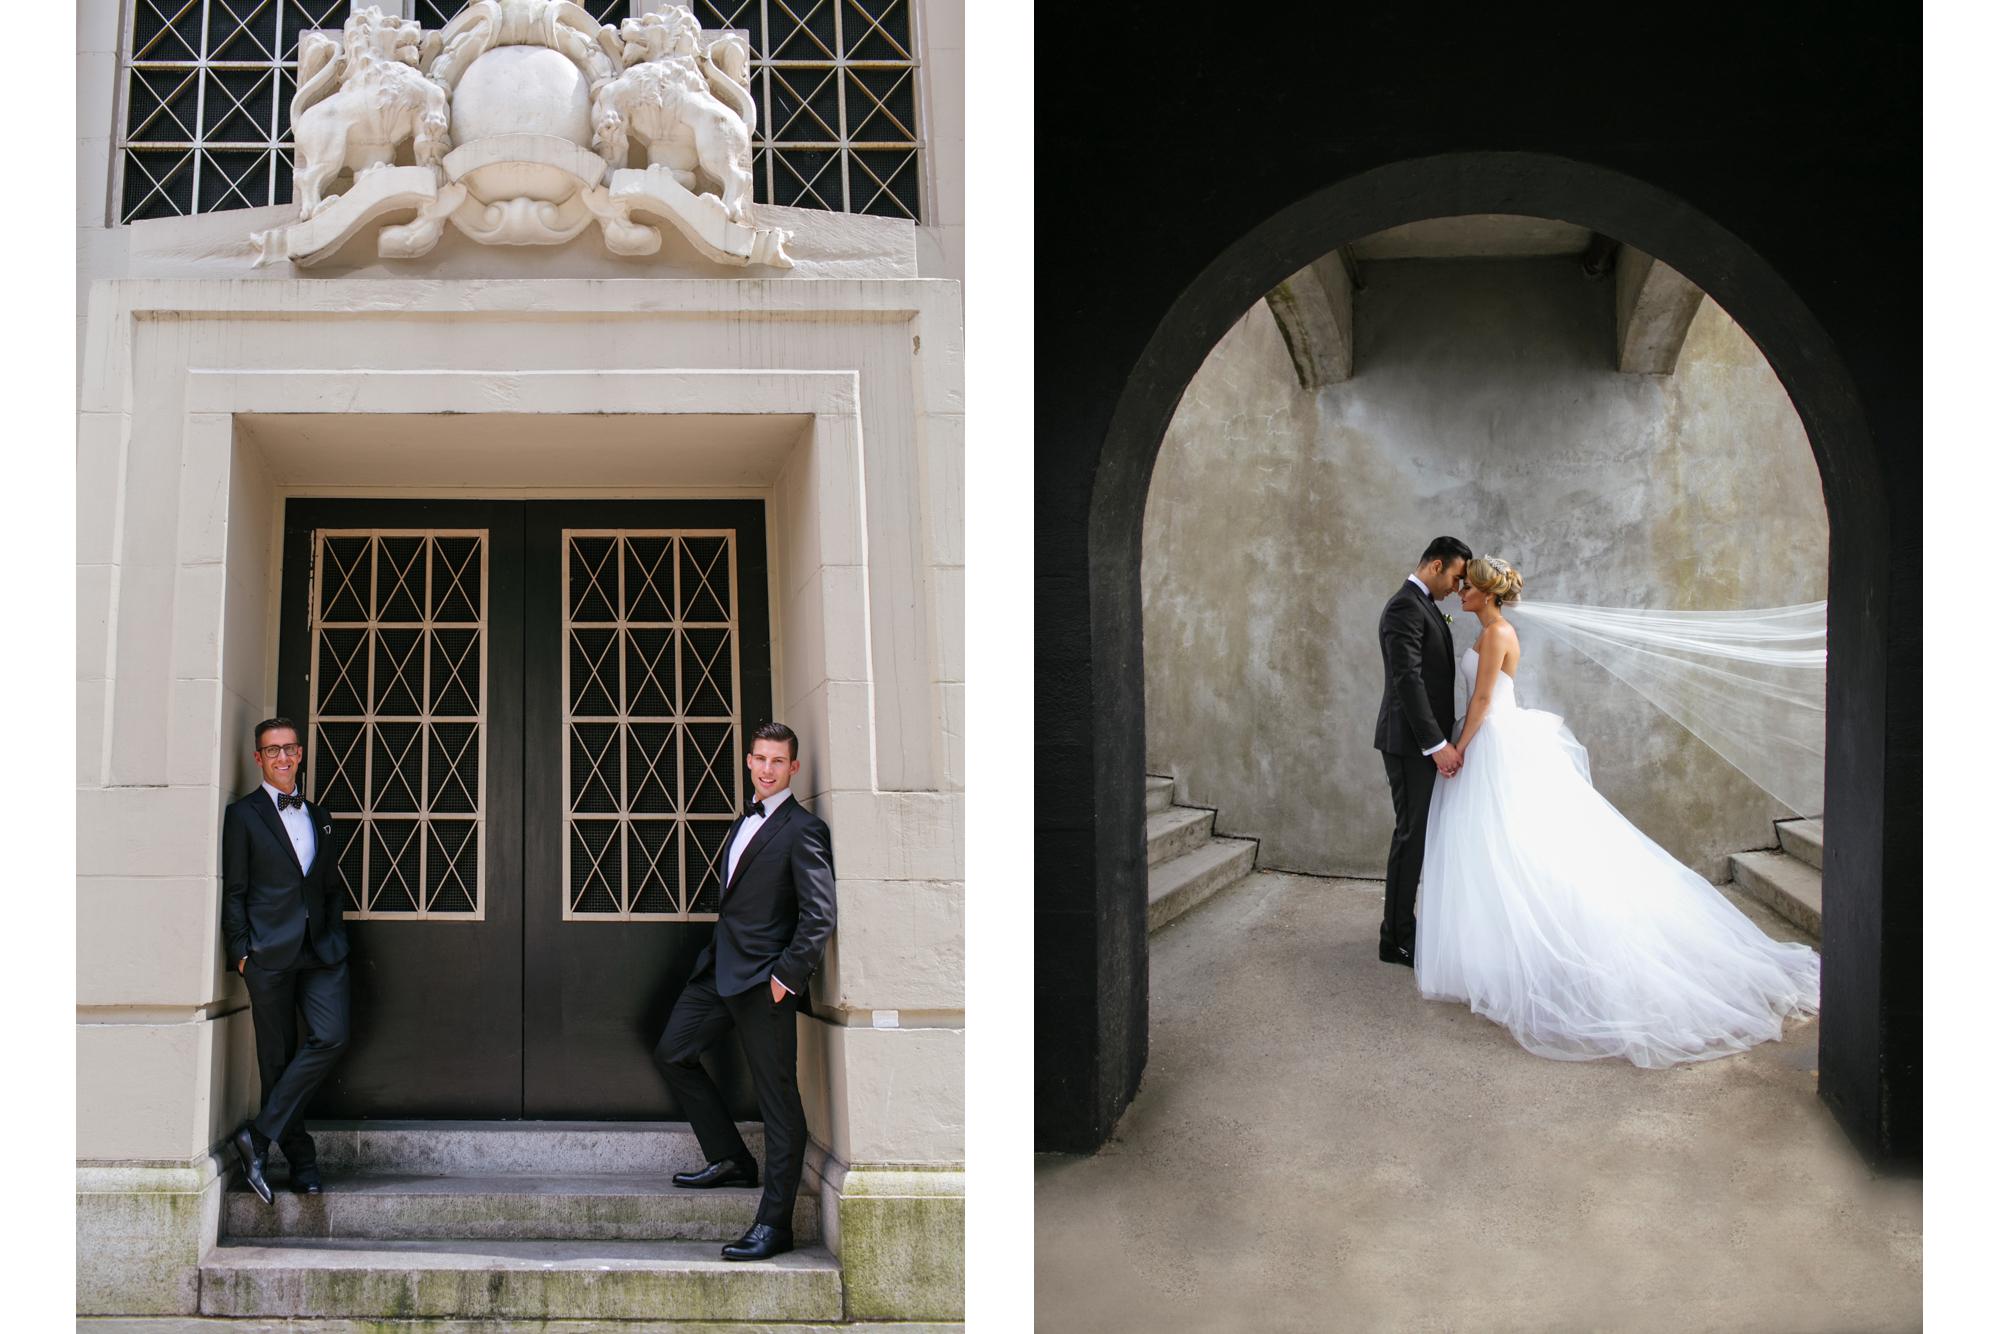 vancouver-luxury-wedding-photographer-lori-miles-11.jpg